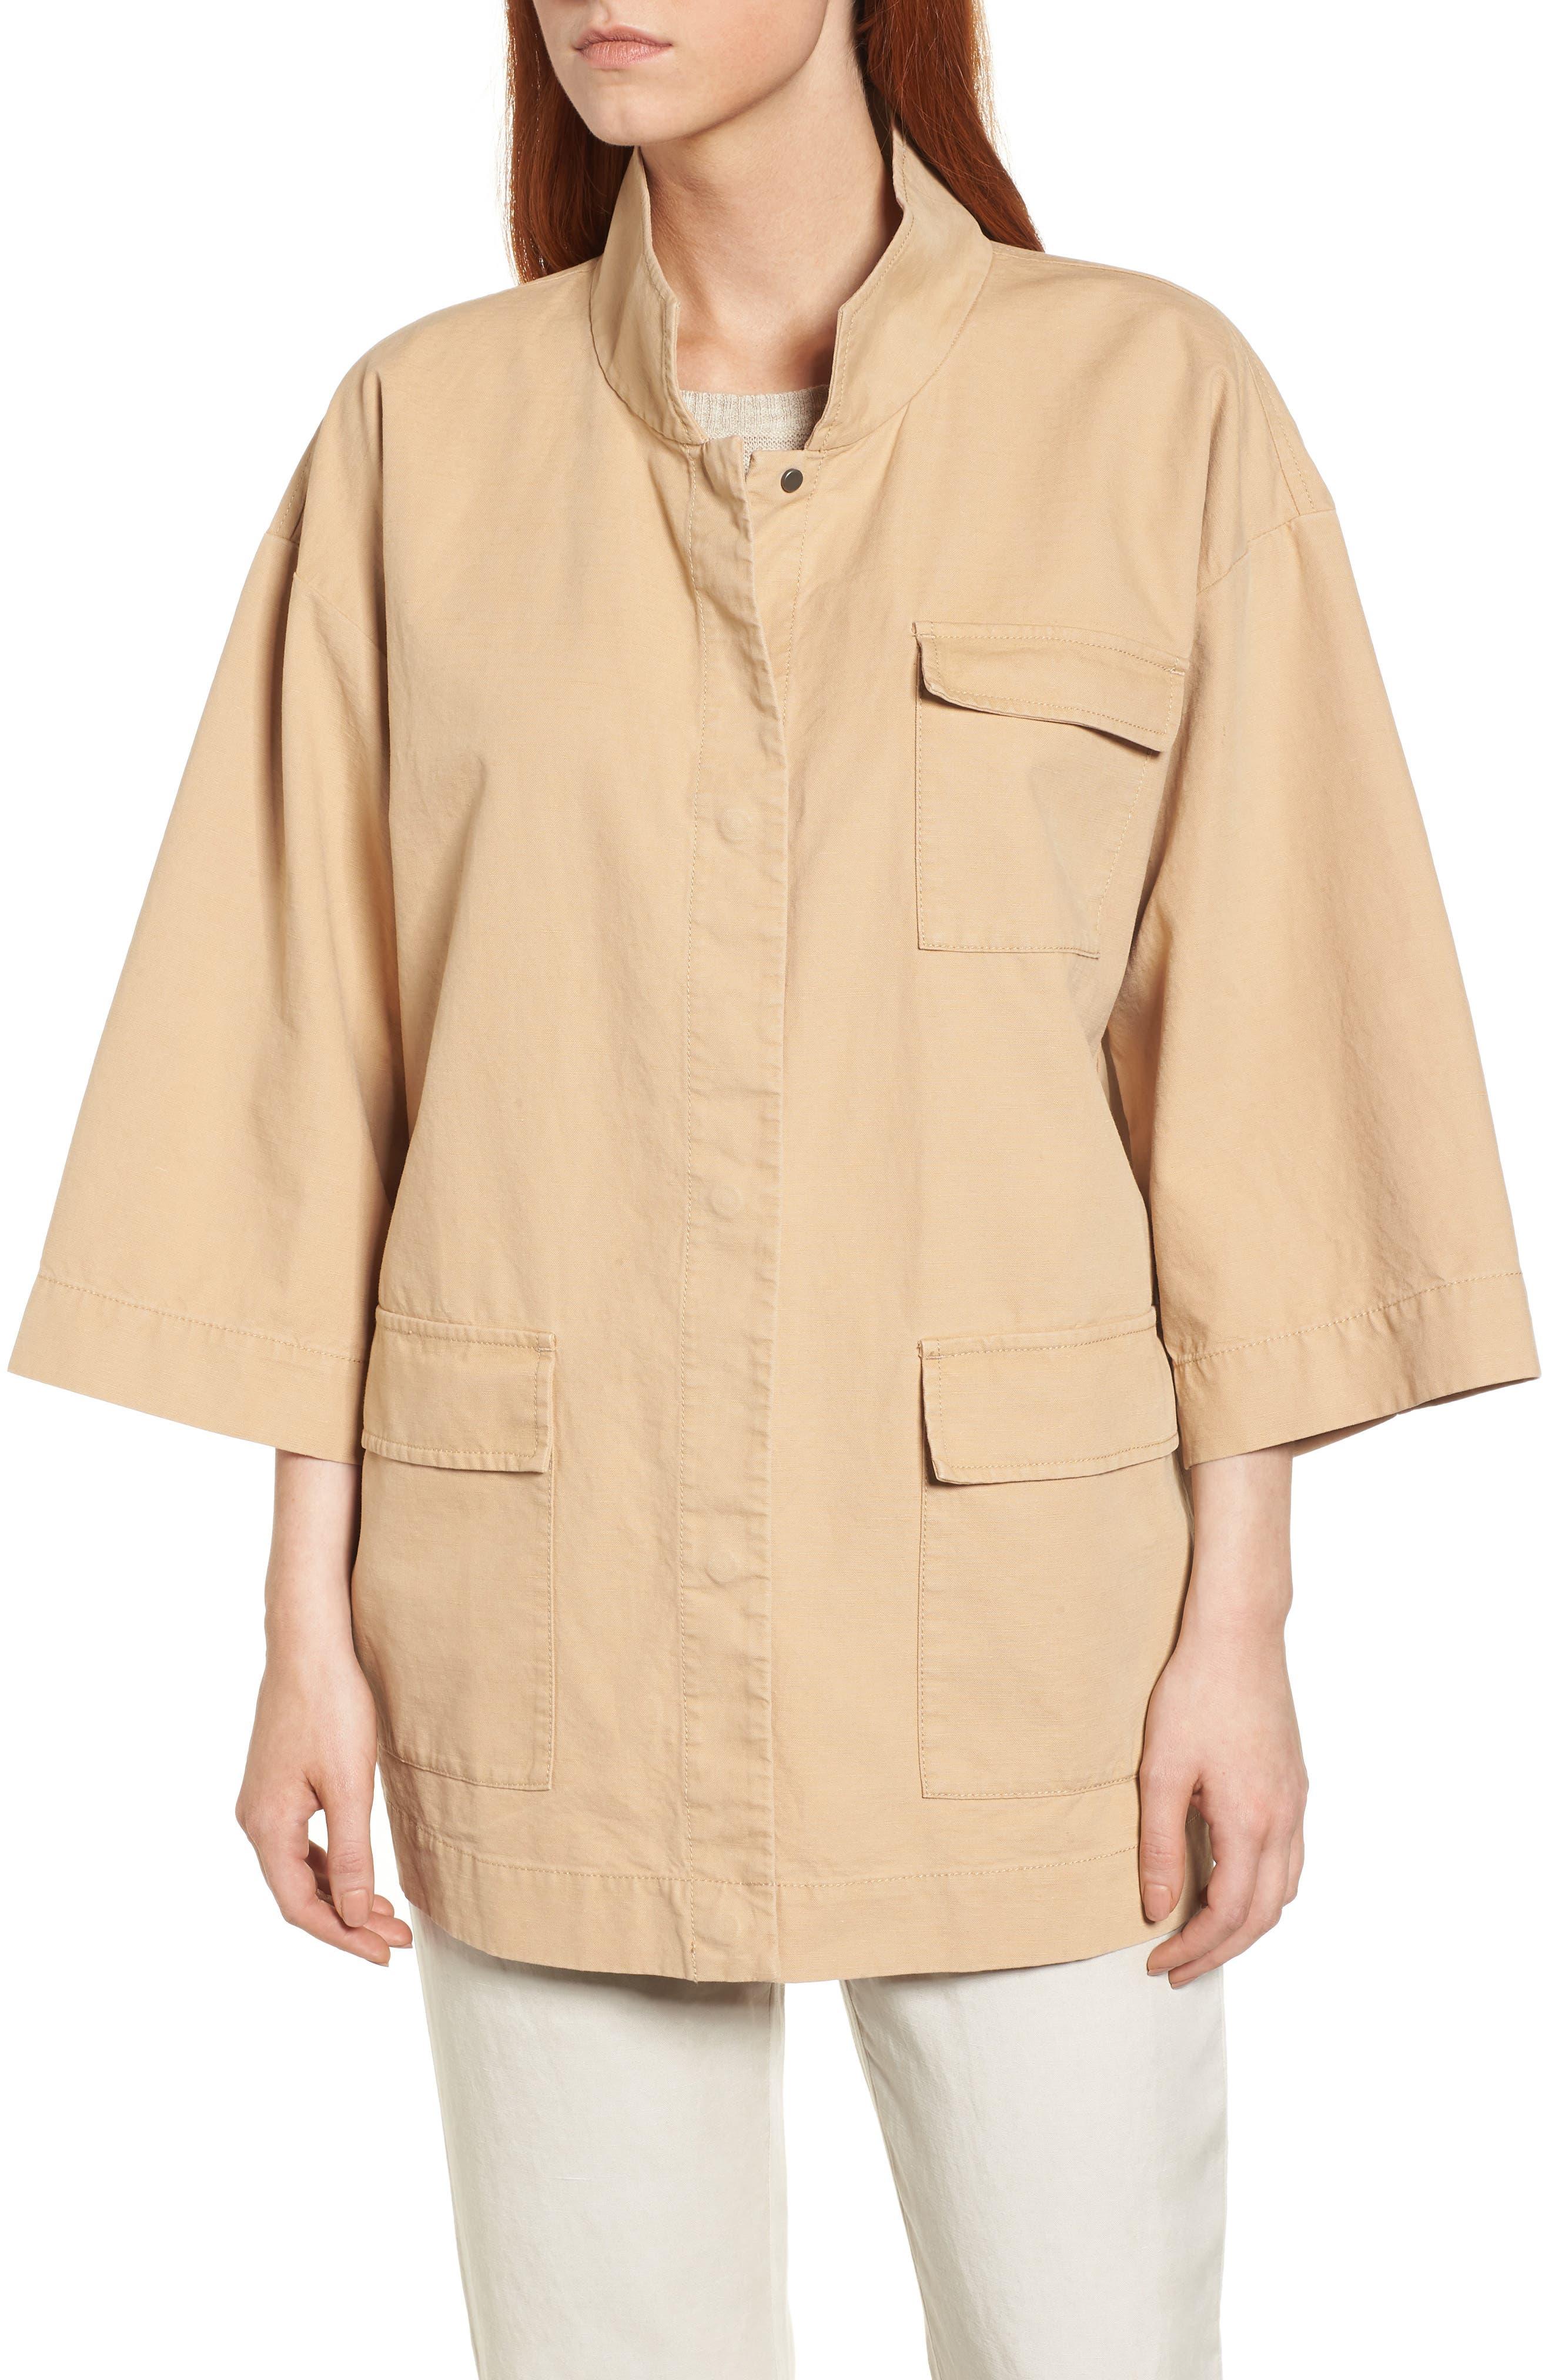 Organic Cotton & Hemp Jacket,                             Alternate thumbnail 4, color,                             Wheat